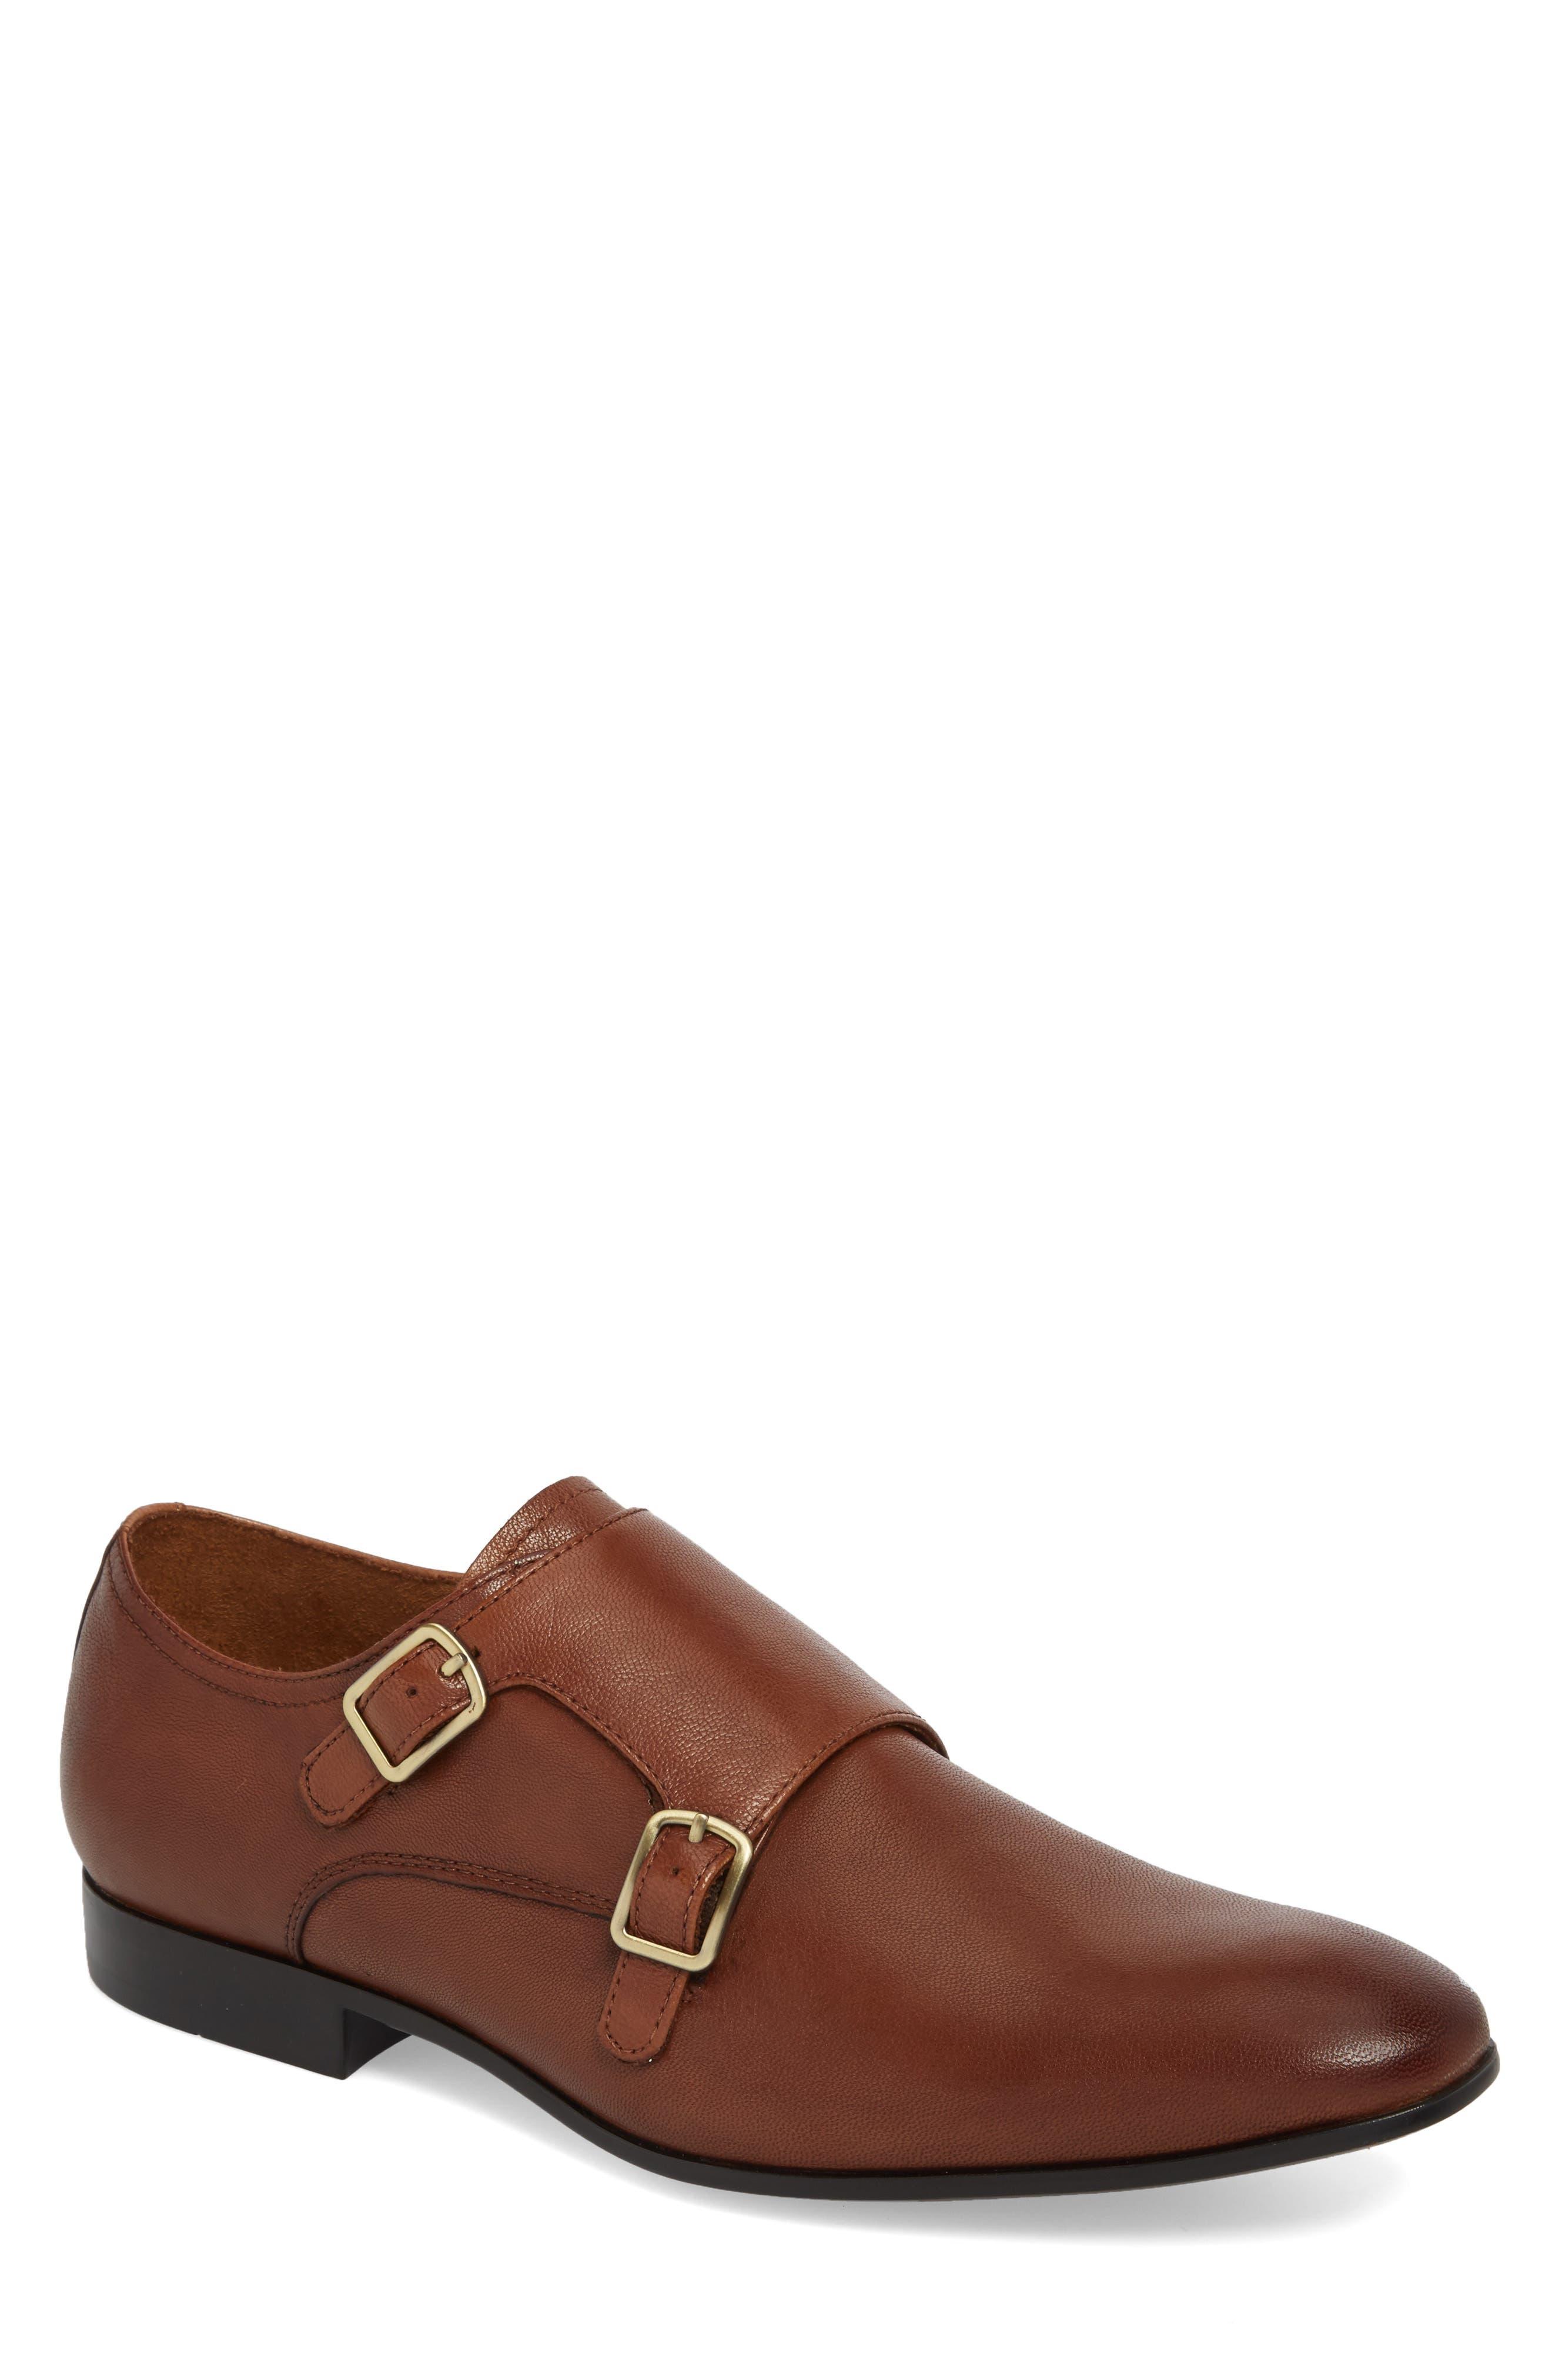 Kenneth Cole New York Mix Double Monk Strap Shoe (Men)